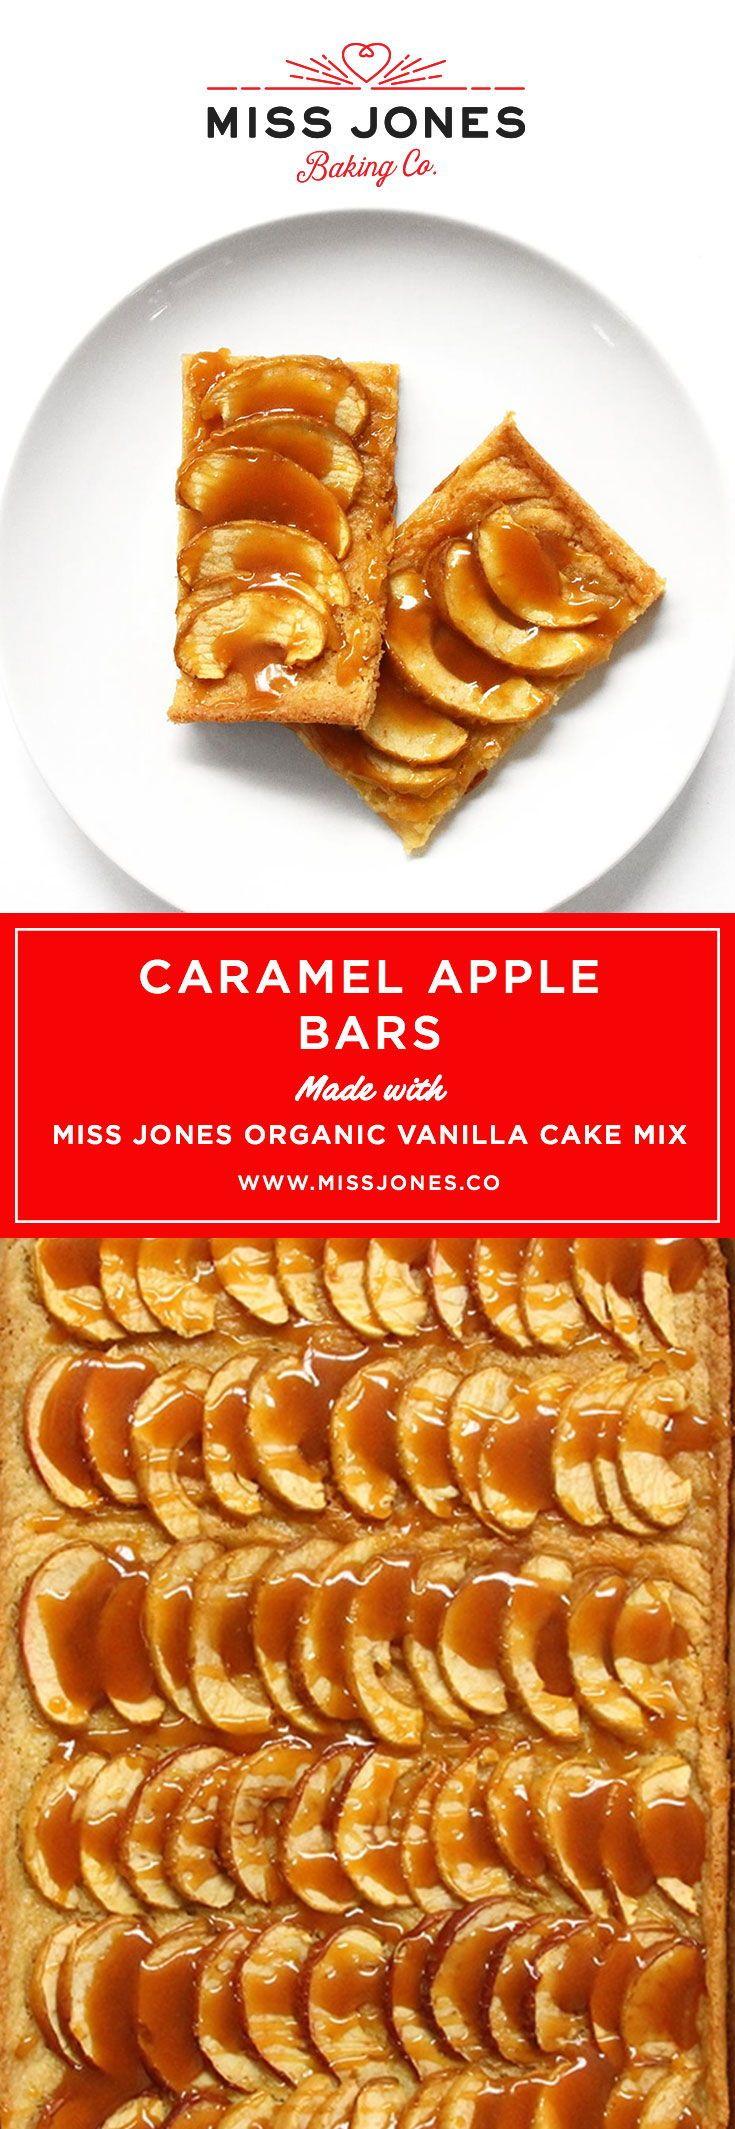 Caramel apple bars recipe miss jones baking co apple